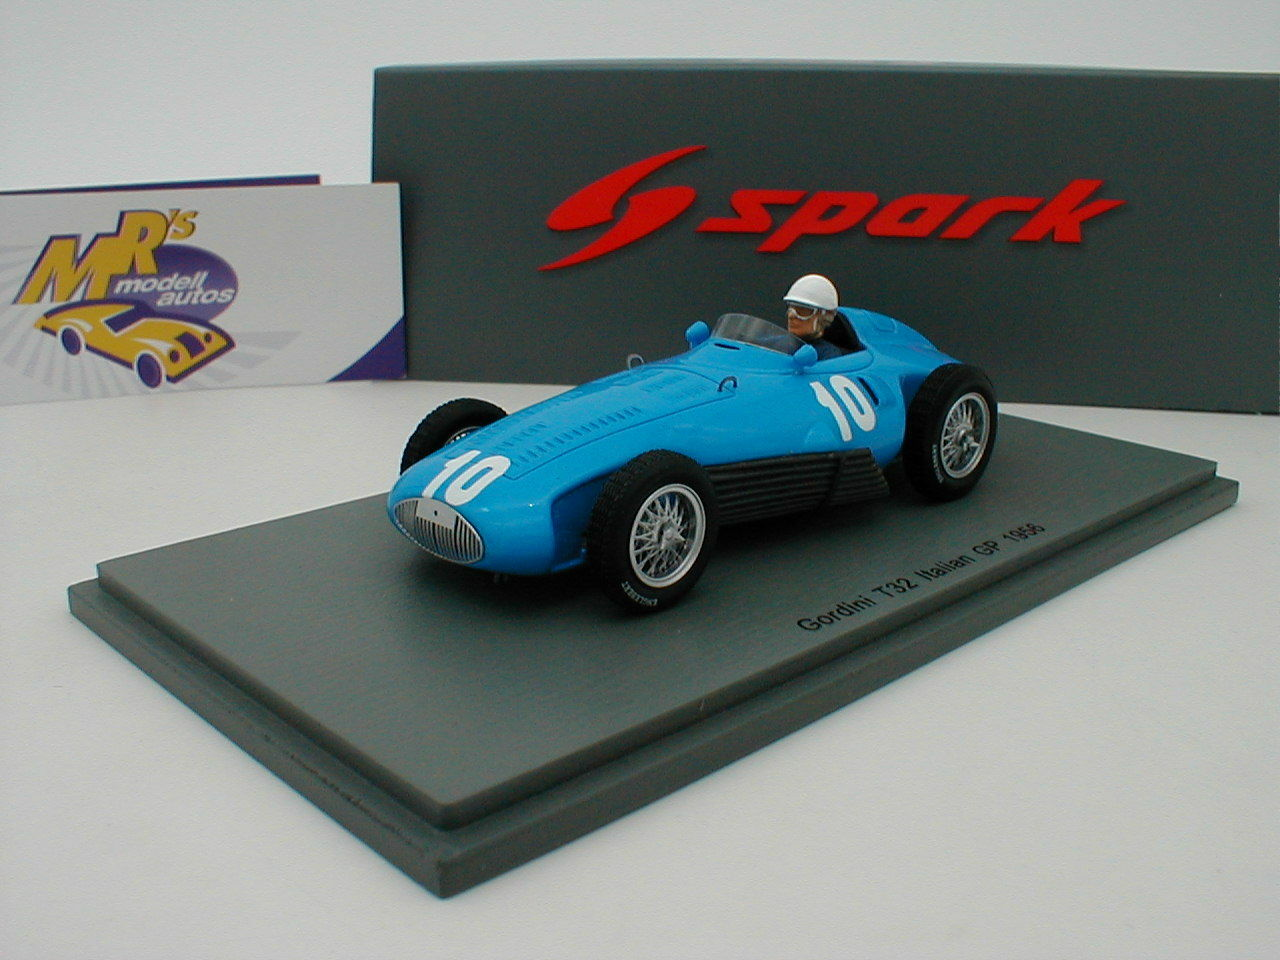 Spark s5315-Gordini t32 nº 10 Italian gp 1956  Robert Manzon  1 43 novedad